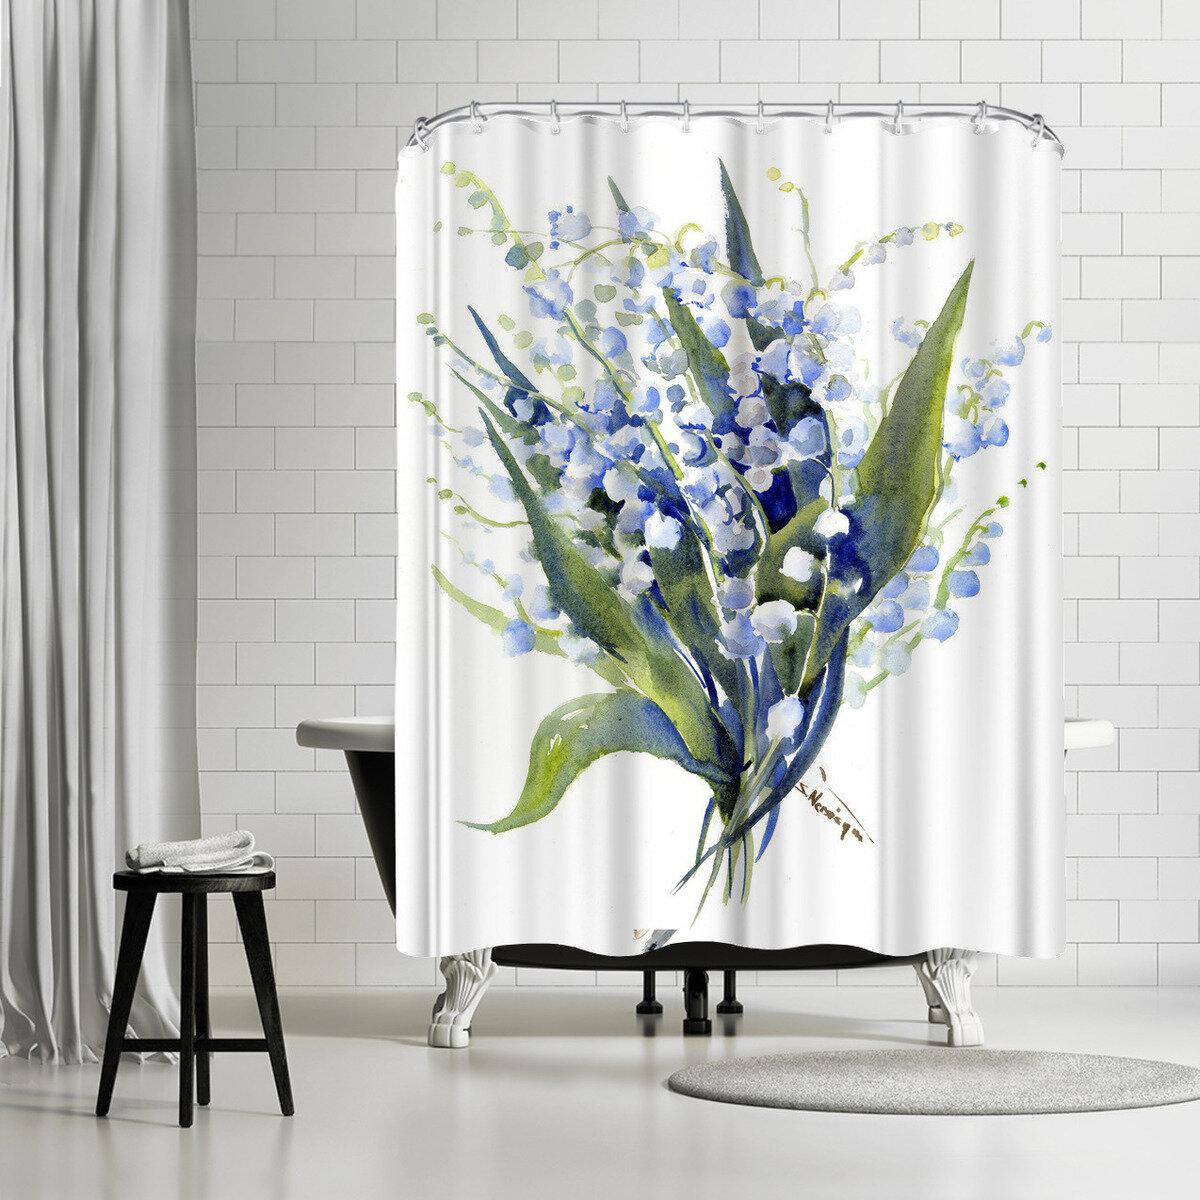 East Urban Home Suren Nersisyan Barn Owl Single Shower Curtain Wayfair